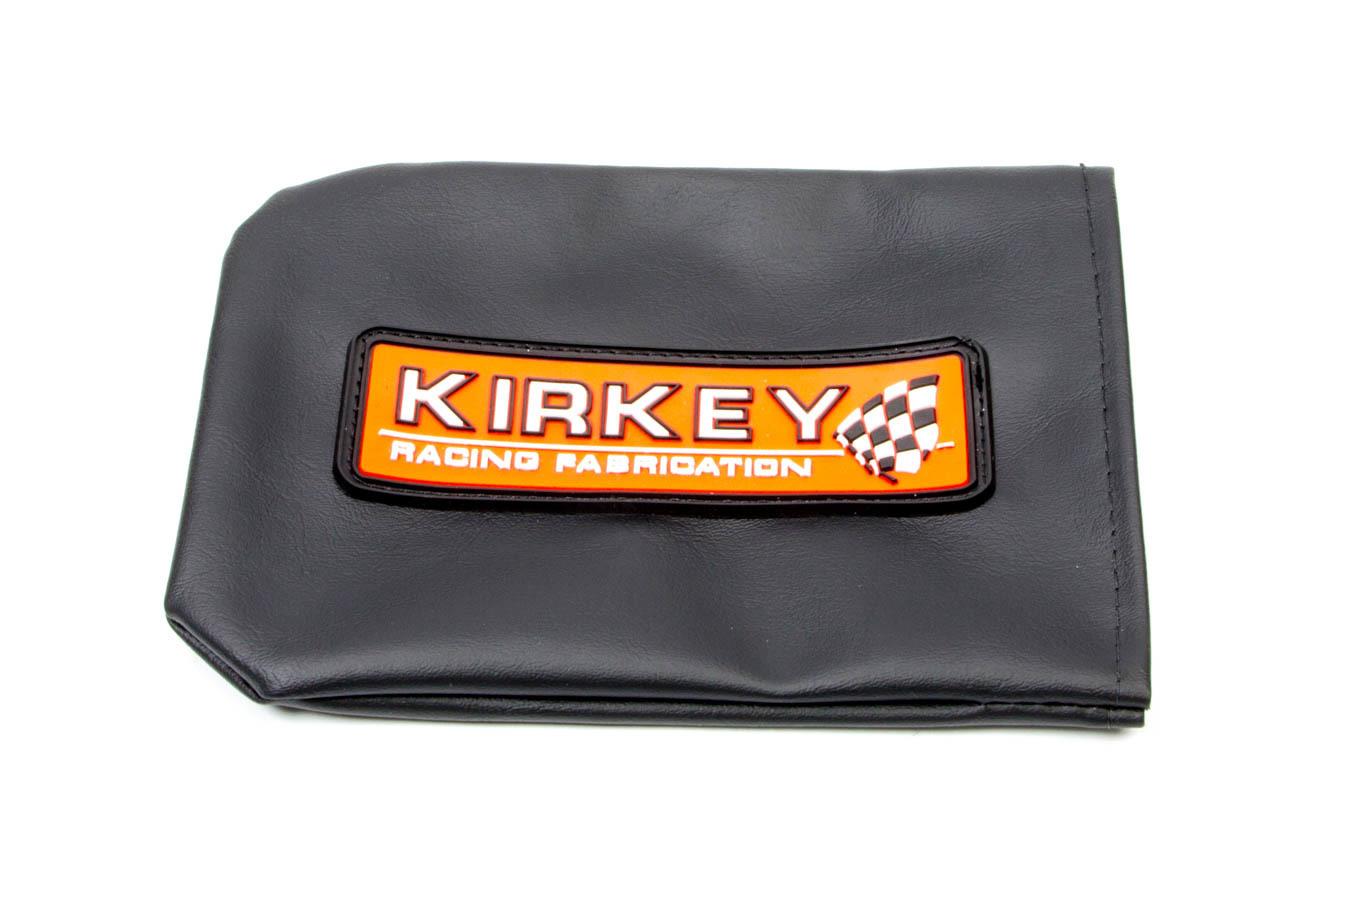 Kirkey 00201 Head Support Cover, Driver Side, Vinyl, Black, Each